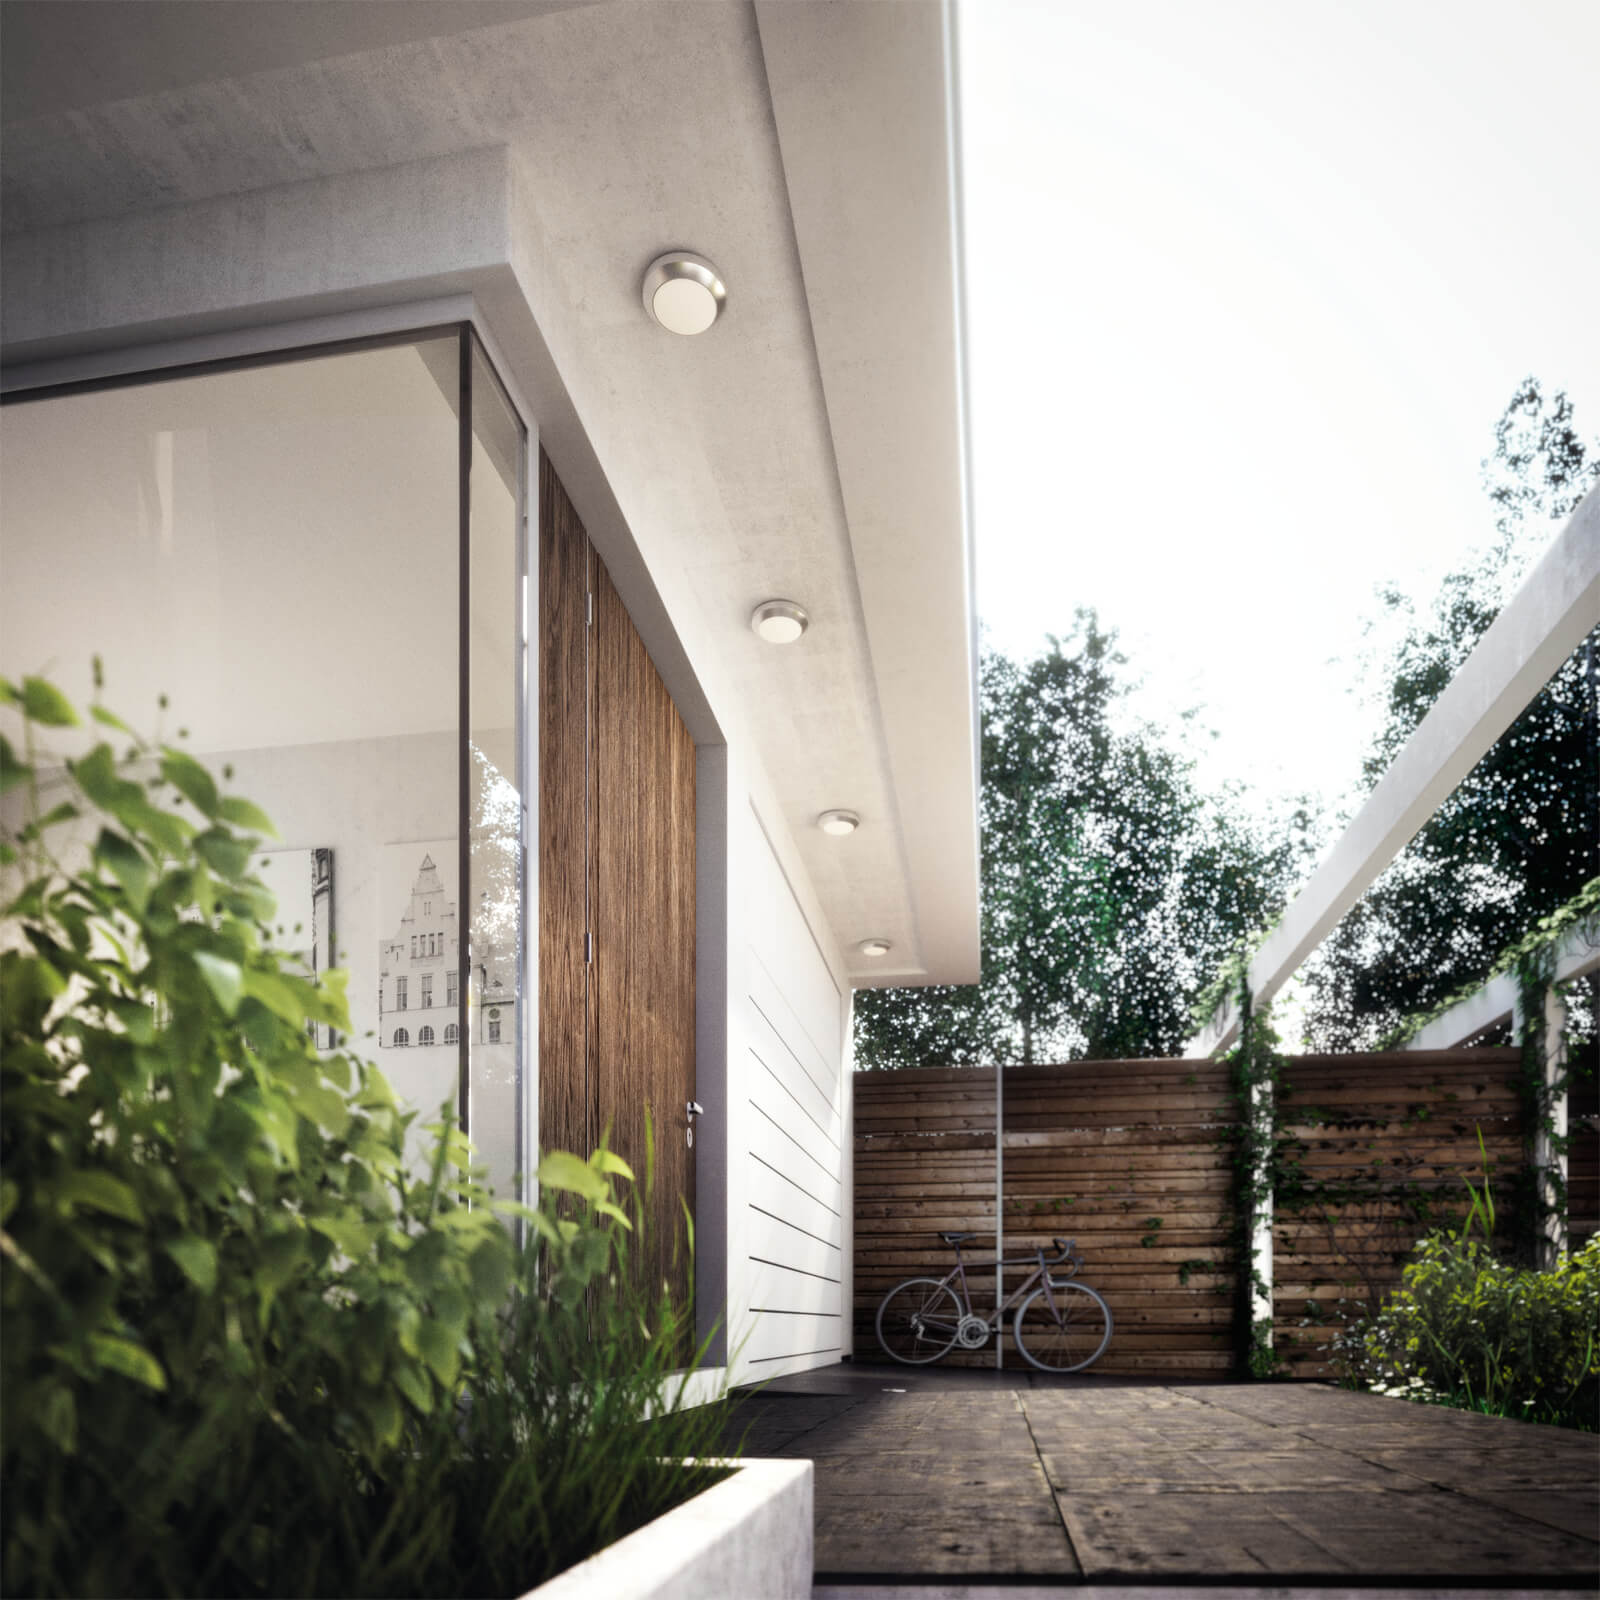 philips mygarden halo wandlamp rvs. Black Bedroom Furniture Sets. Home Design Ideas